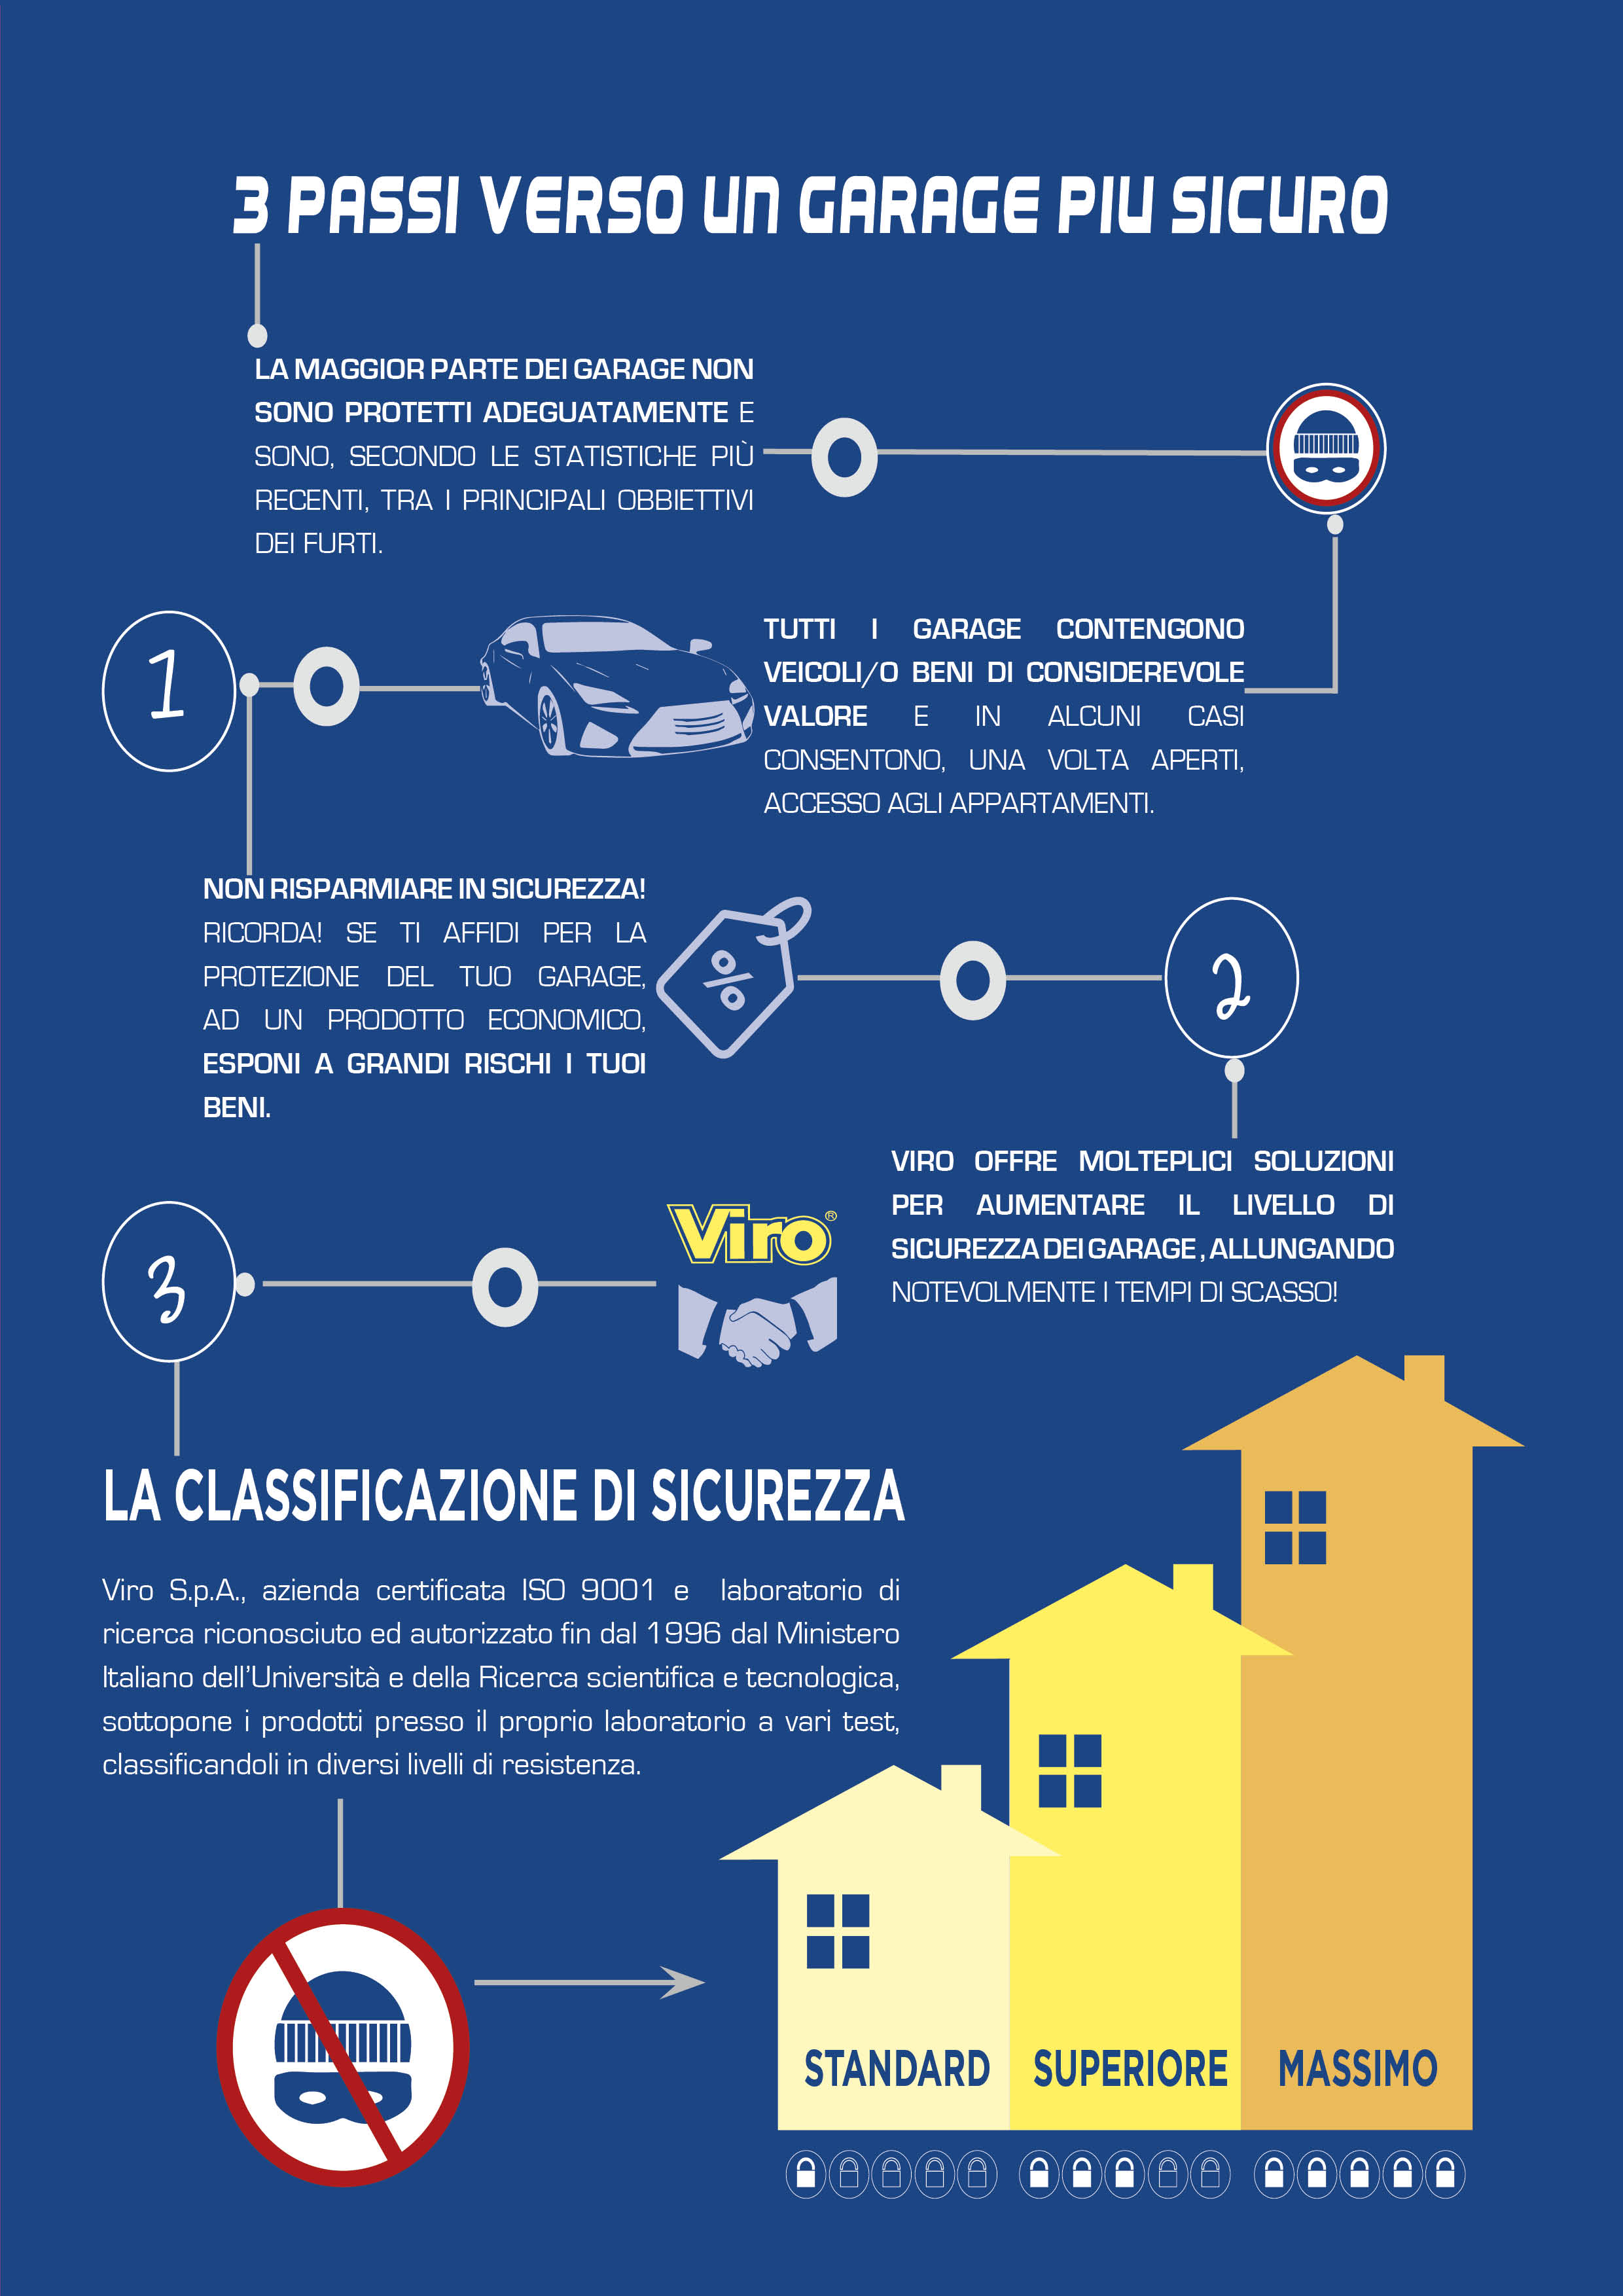 infografica-garage-sicuro